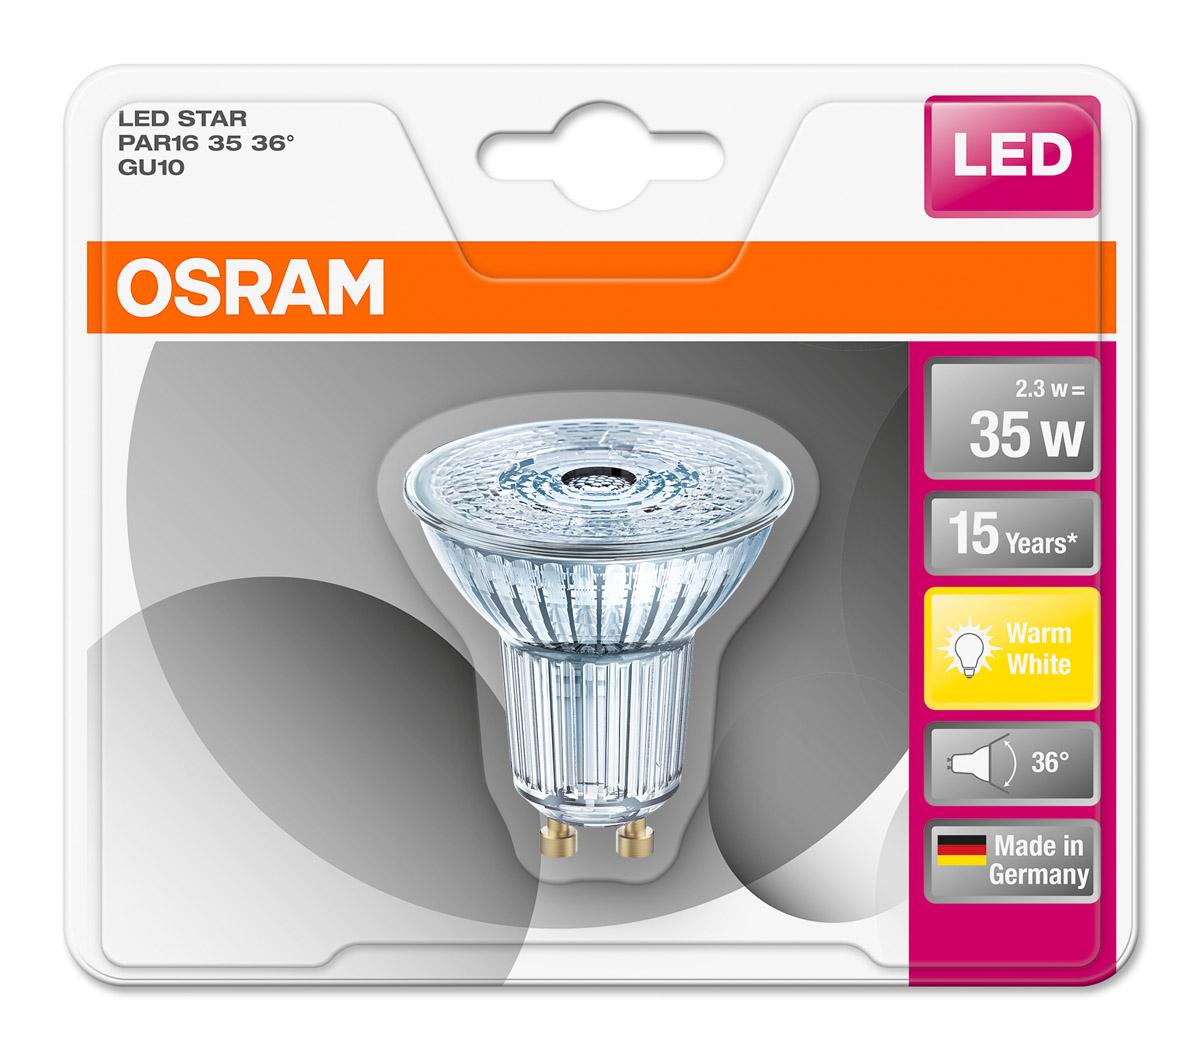 osram led star glas par16 gu10 2 3w 35w 230lm 36 warm white 2700k nodim germany ebay. Black Bedroom Furniture Sets. Home Design Ideas